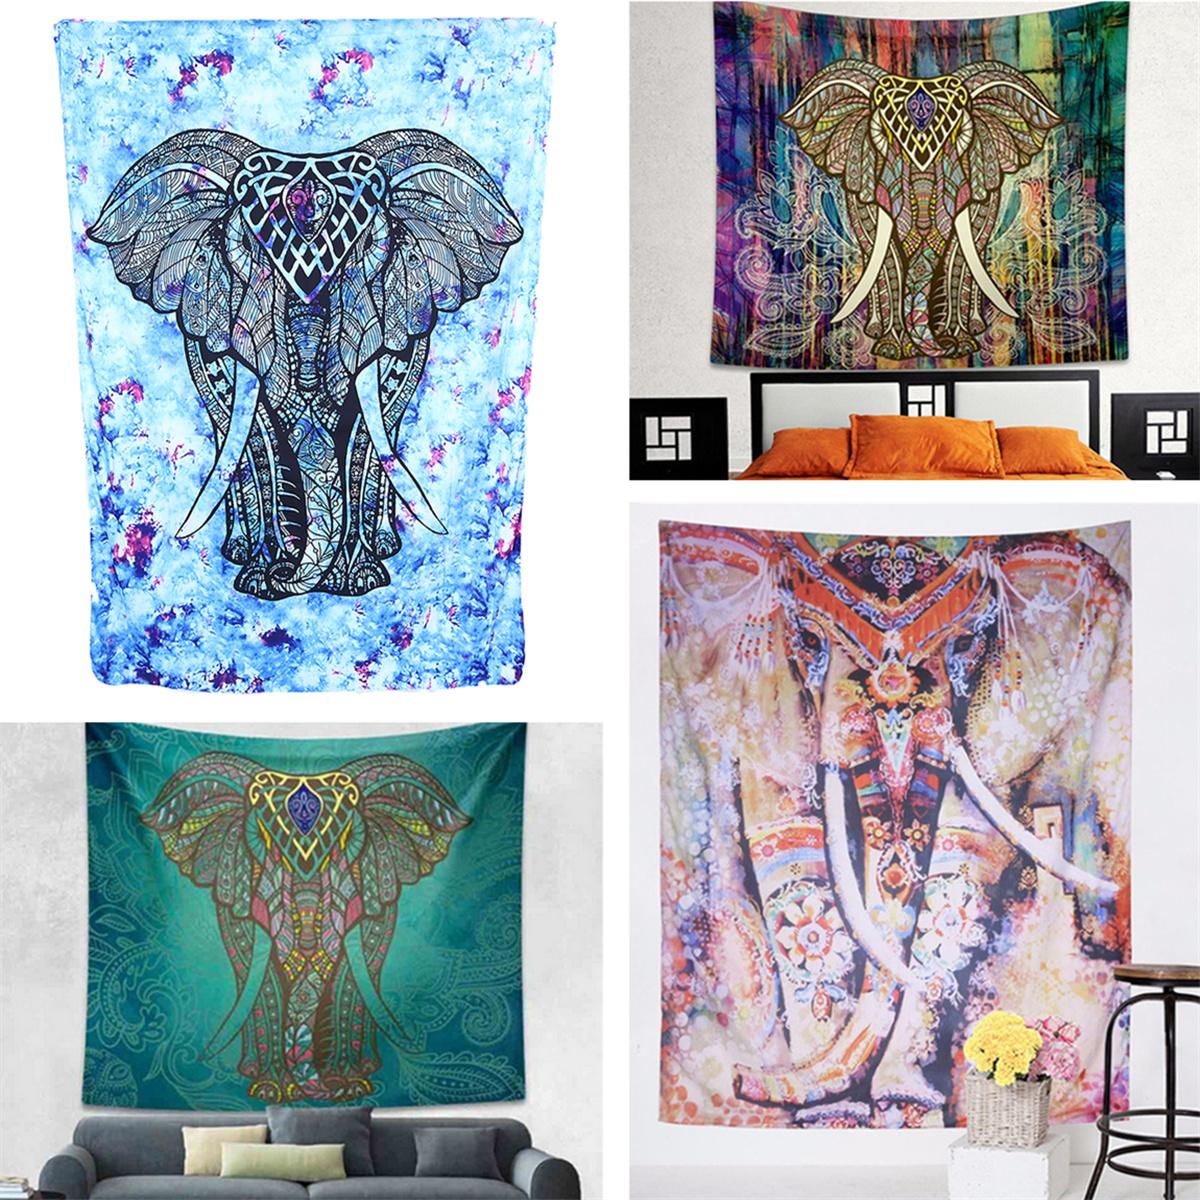 salle de bain psychedelique. Black Bedroom Furniture Sets. Home Design Ideas